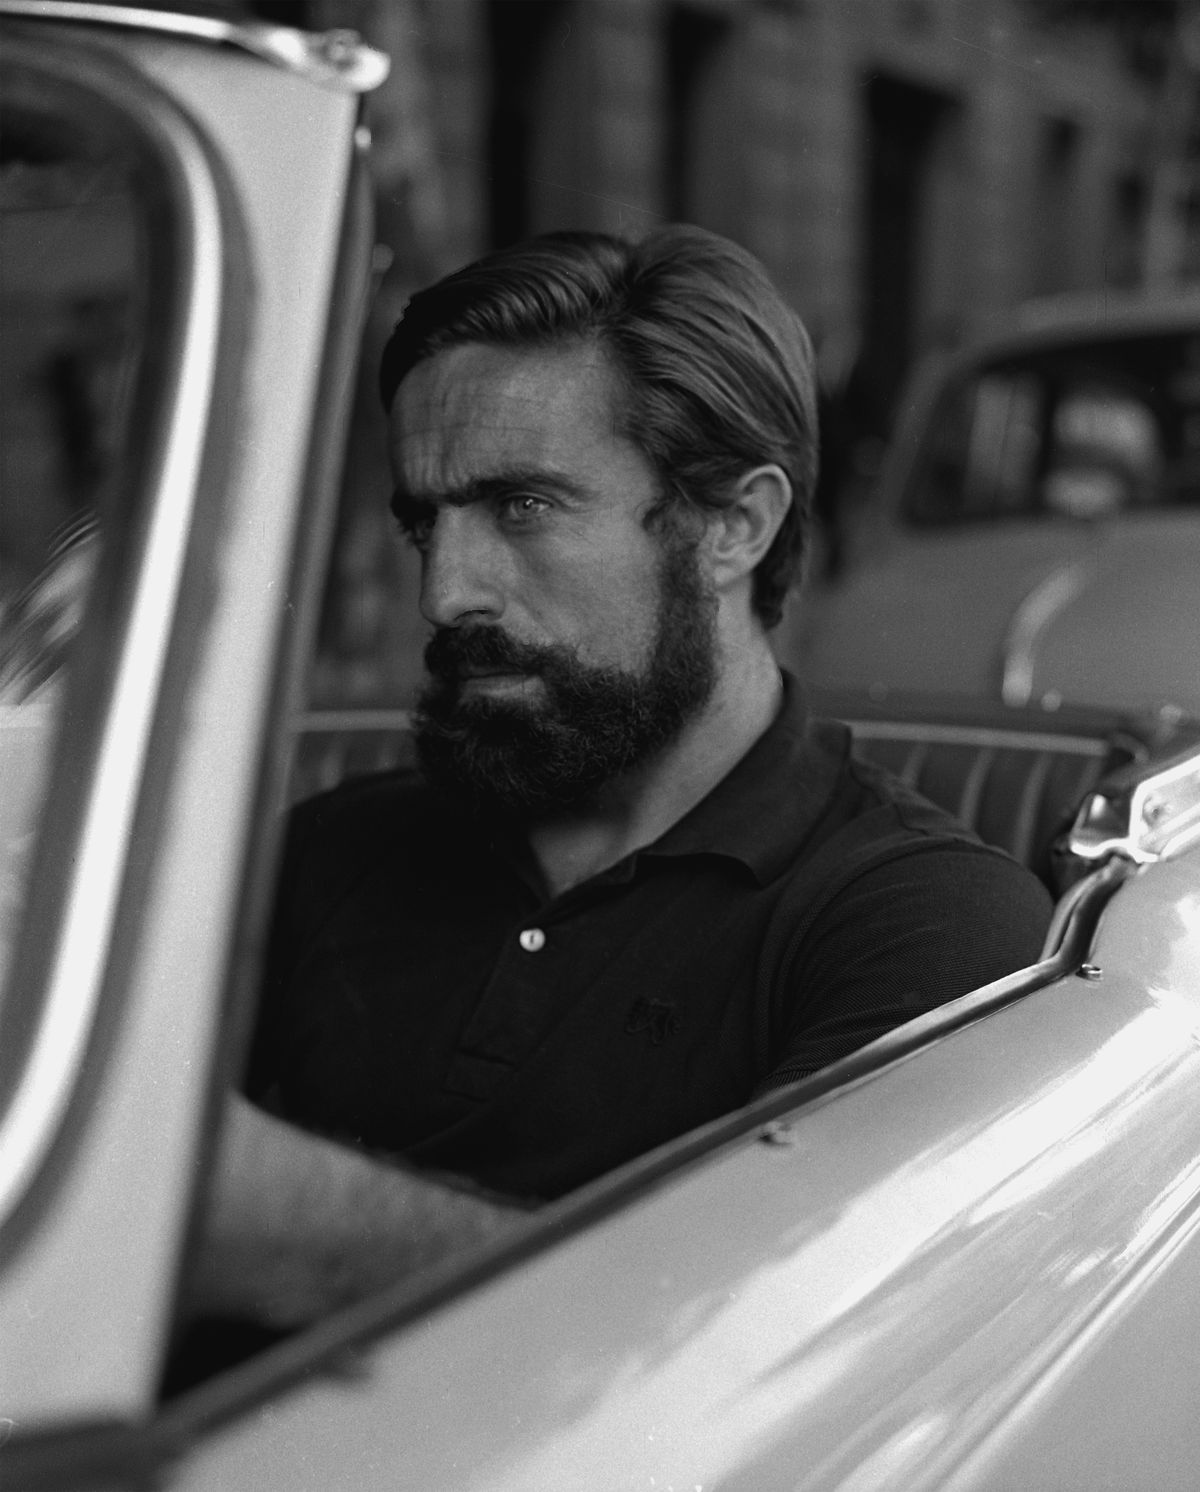 Miguel de la Quadra-Salcedo in a car, looking like a time-traveling Aaron Rodgers